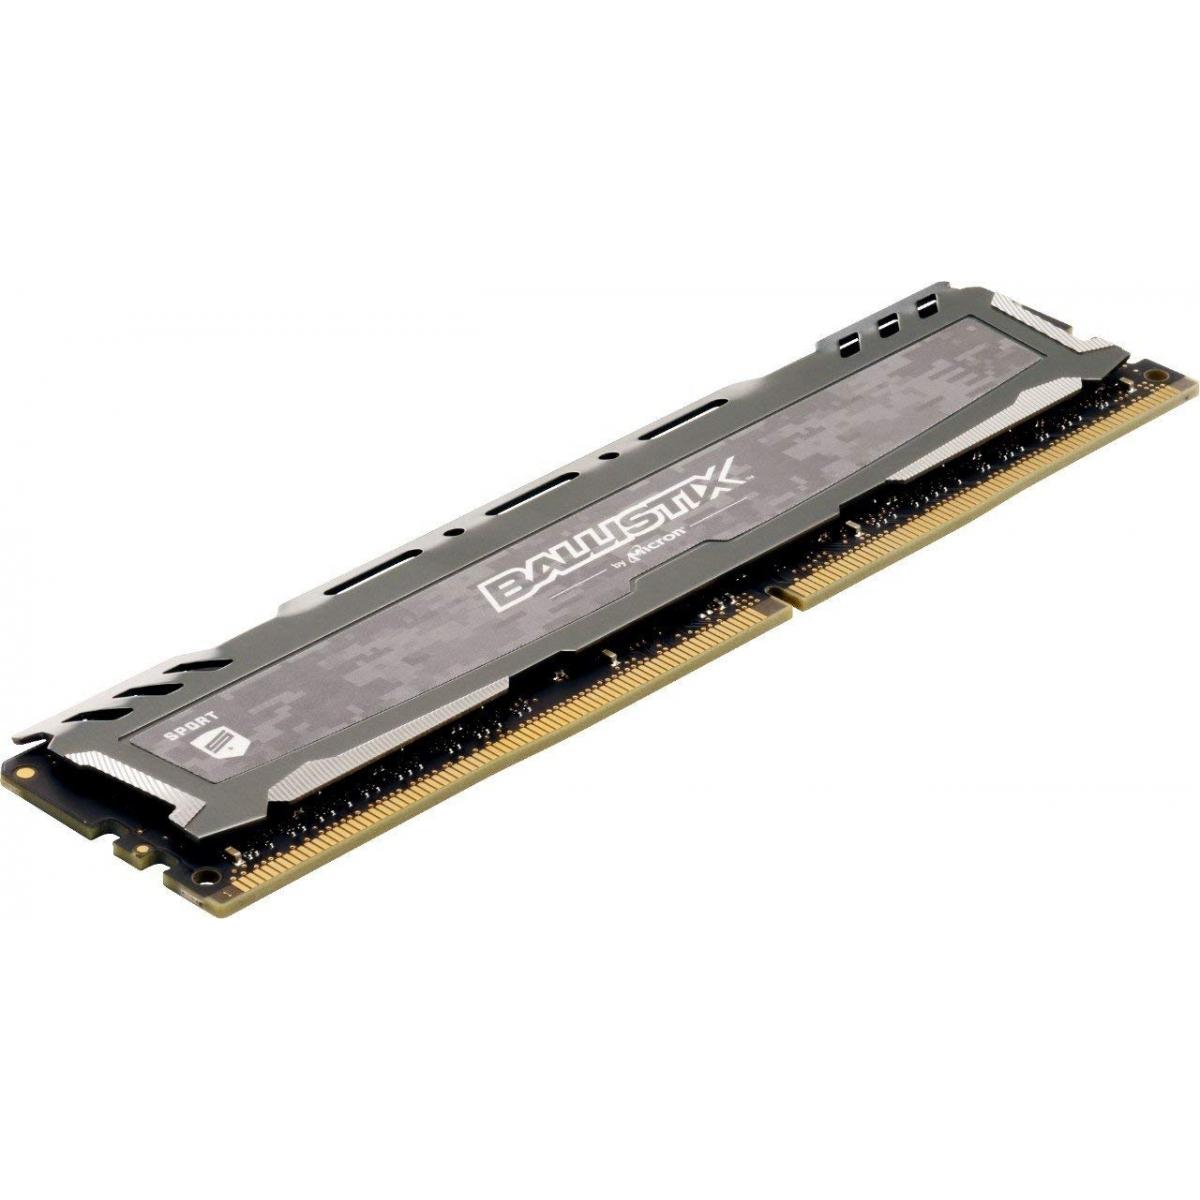 Memória DDR4 Crucial Ballistix Sport Lt, 8GB 3200MHz, Grey, BLS8G4D32AESBK